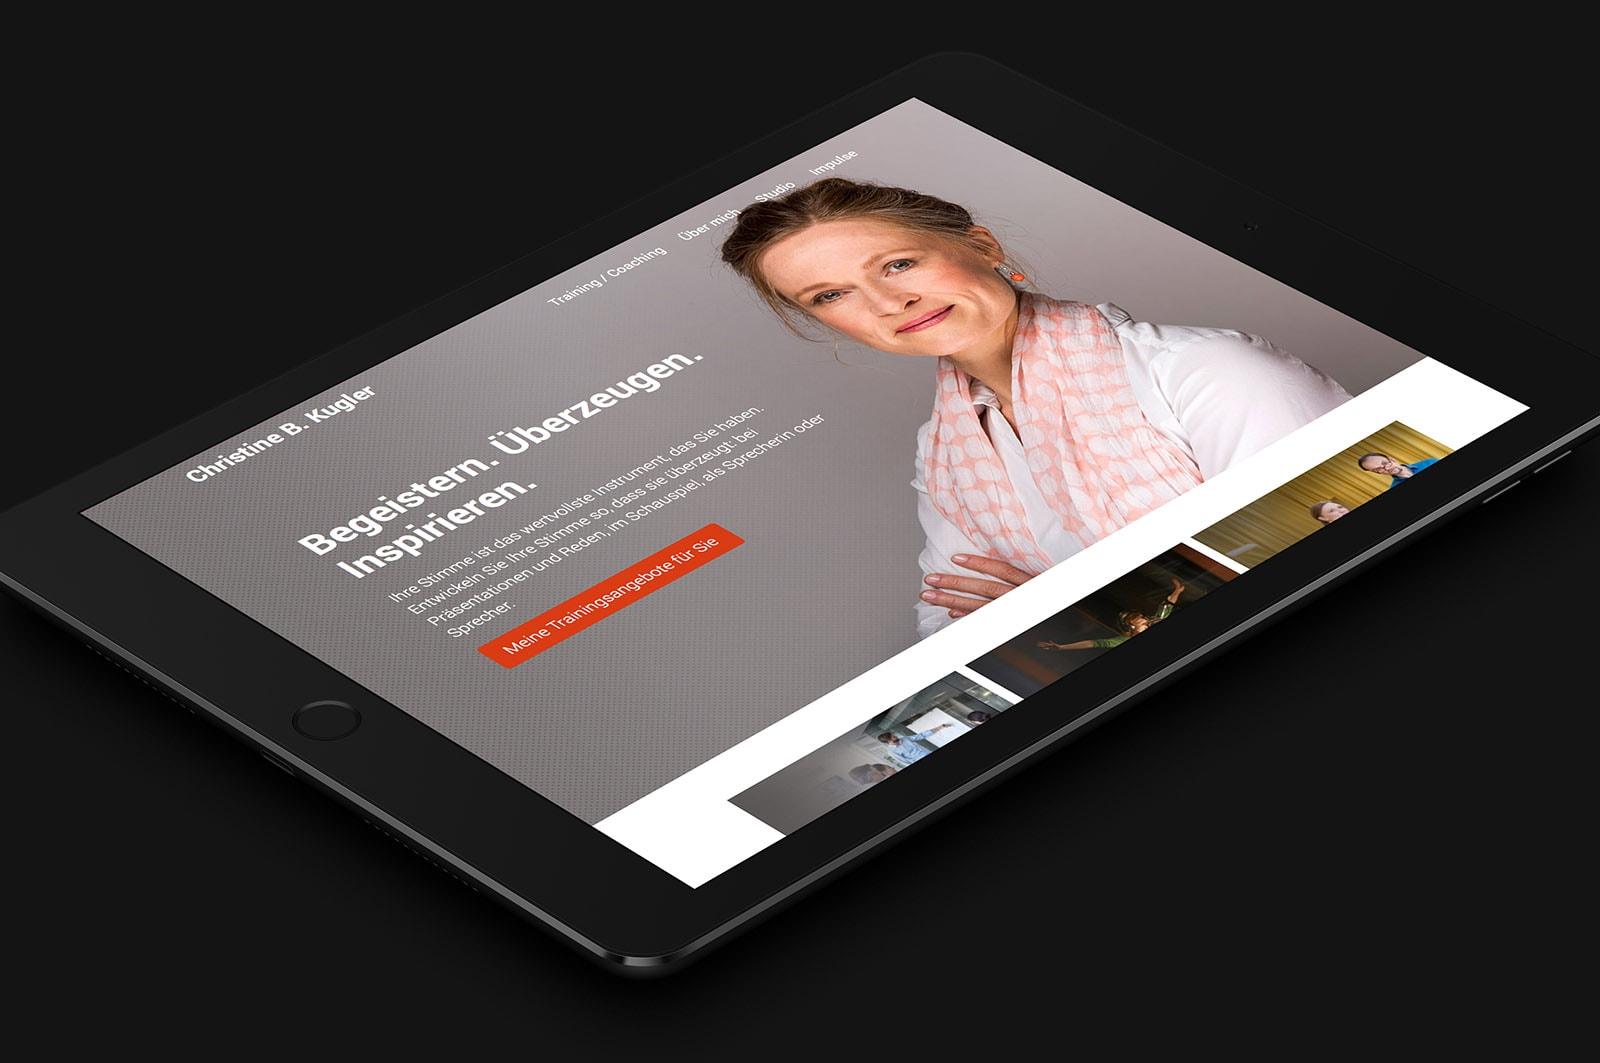 webdesign_ckugler_mockup